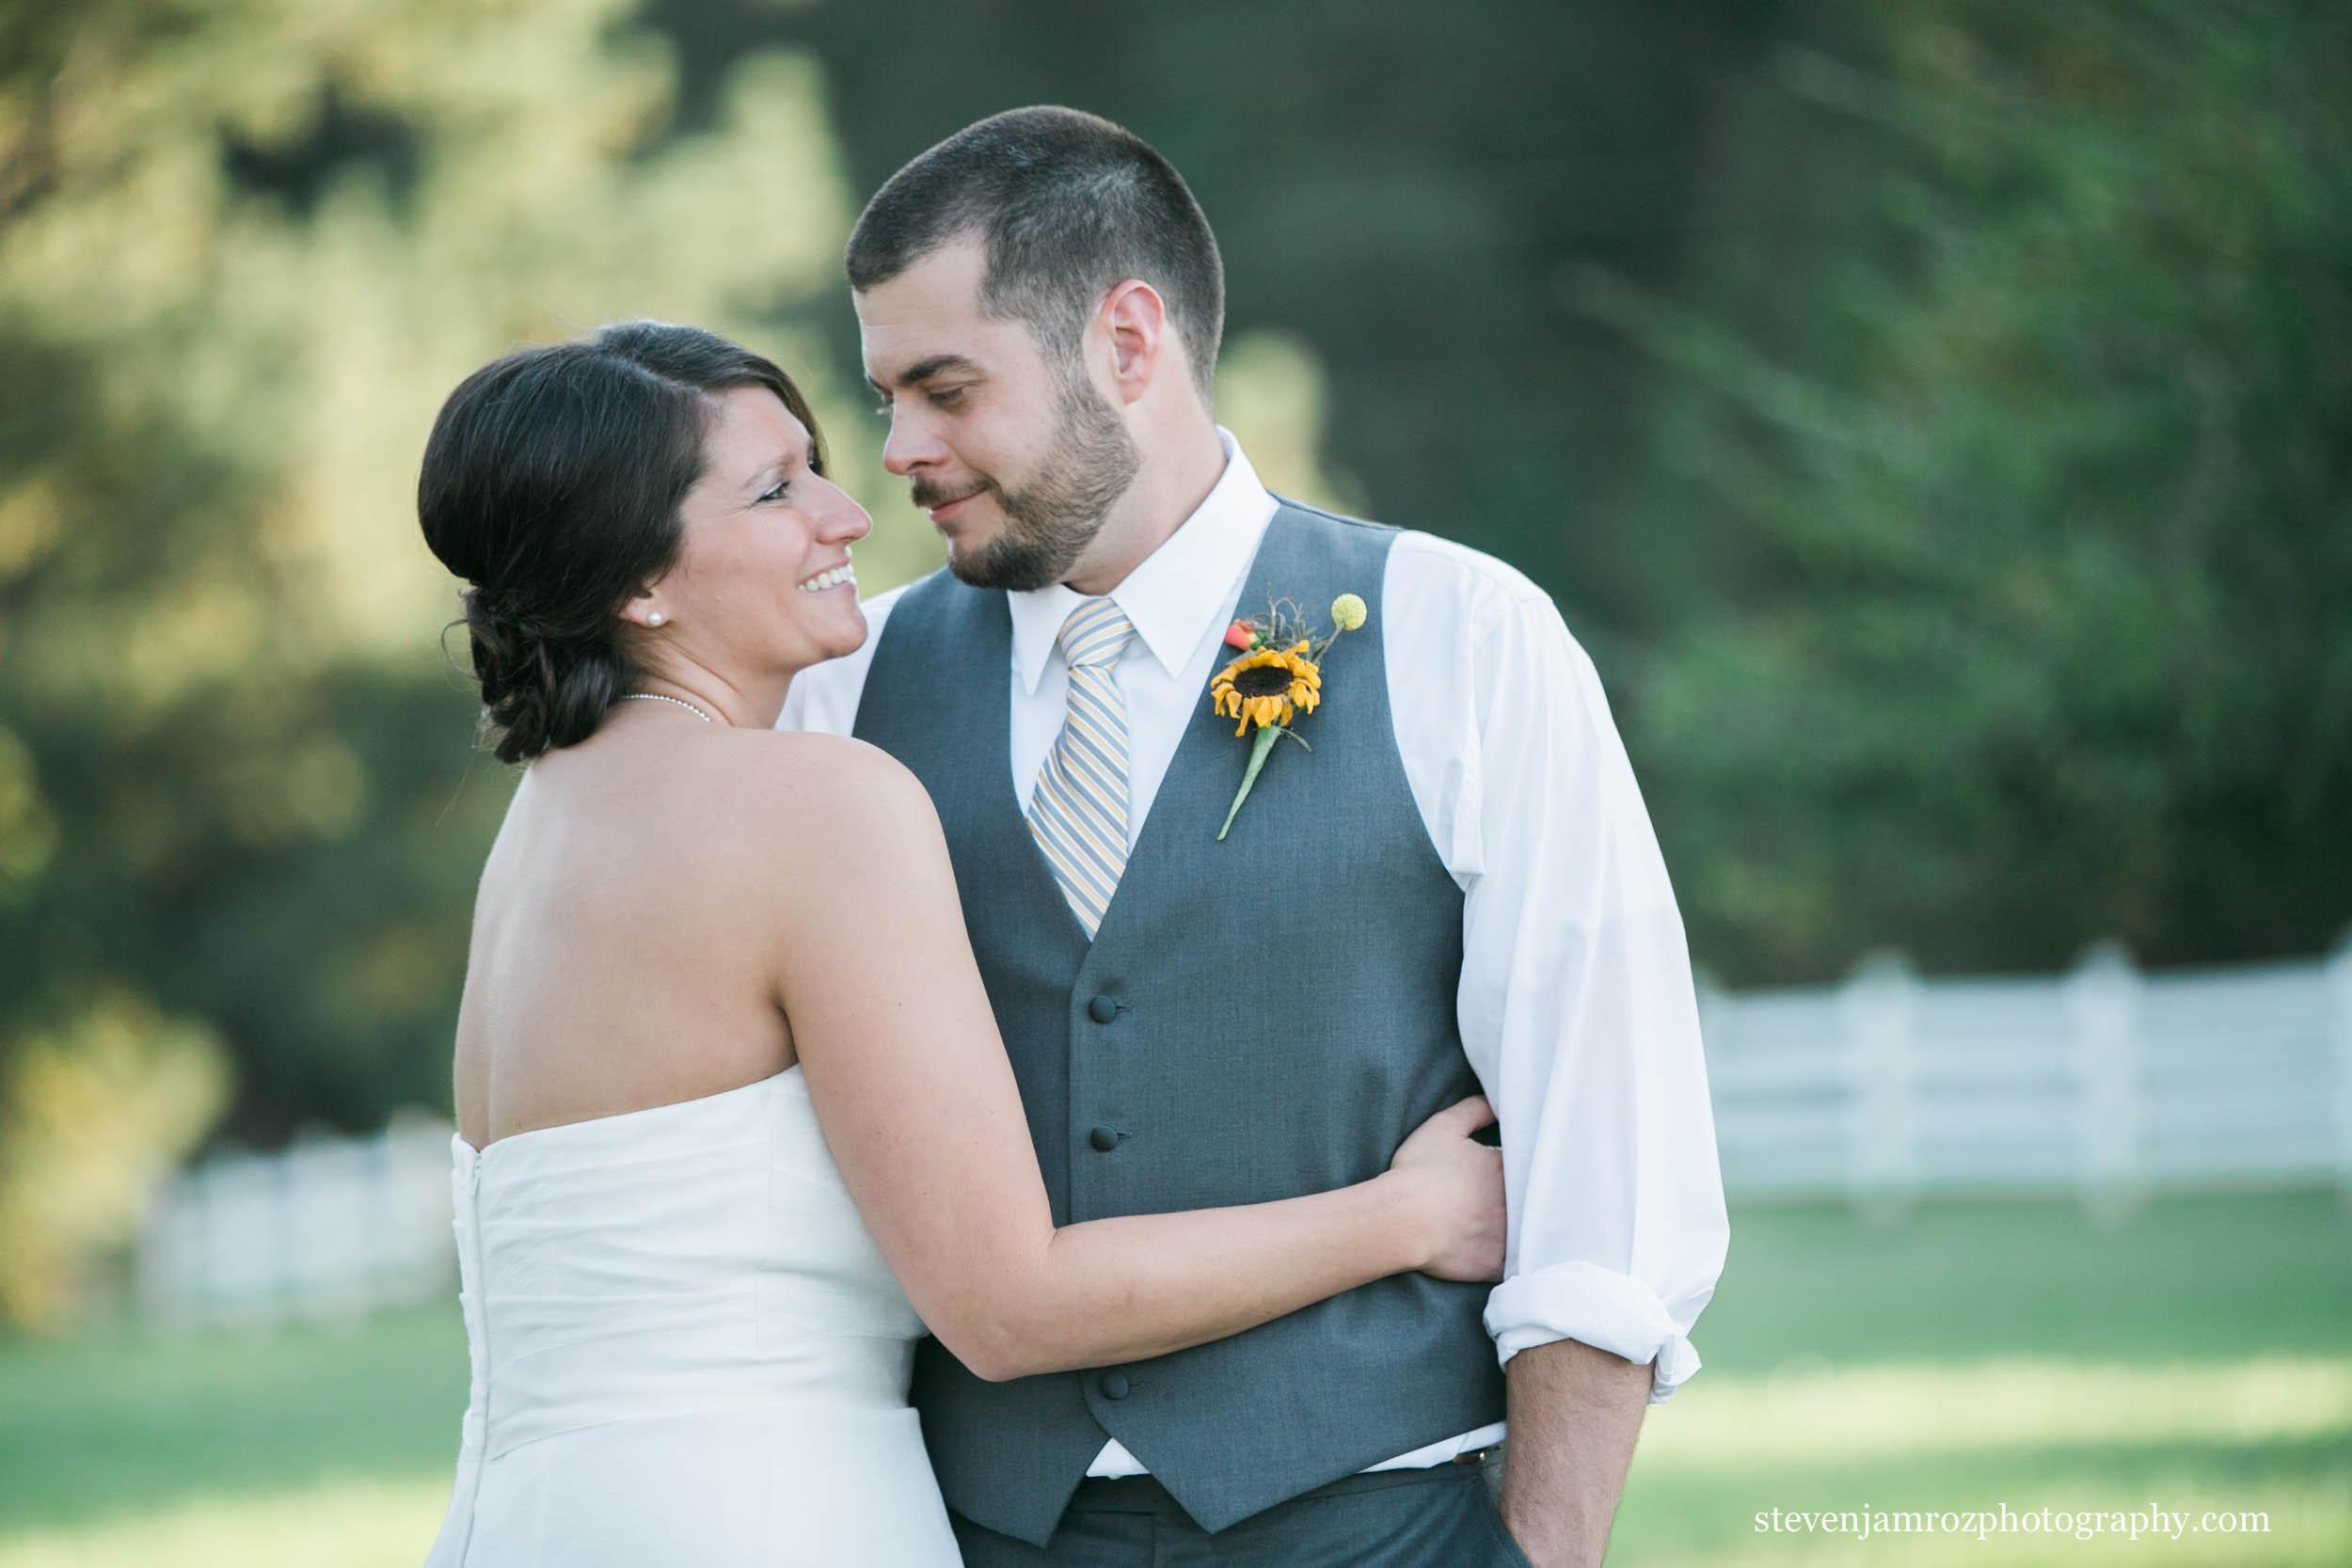 hugs-bride-and-groom-snipes-farm-wedding-steven-jamroz-photography-0452.jpg